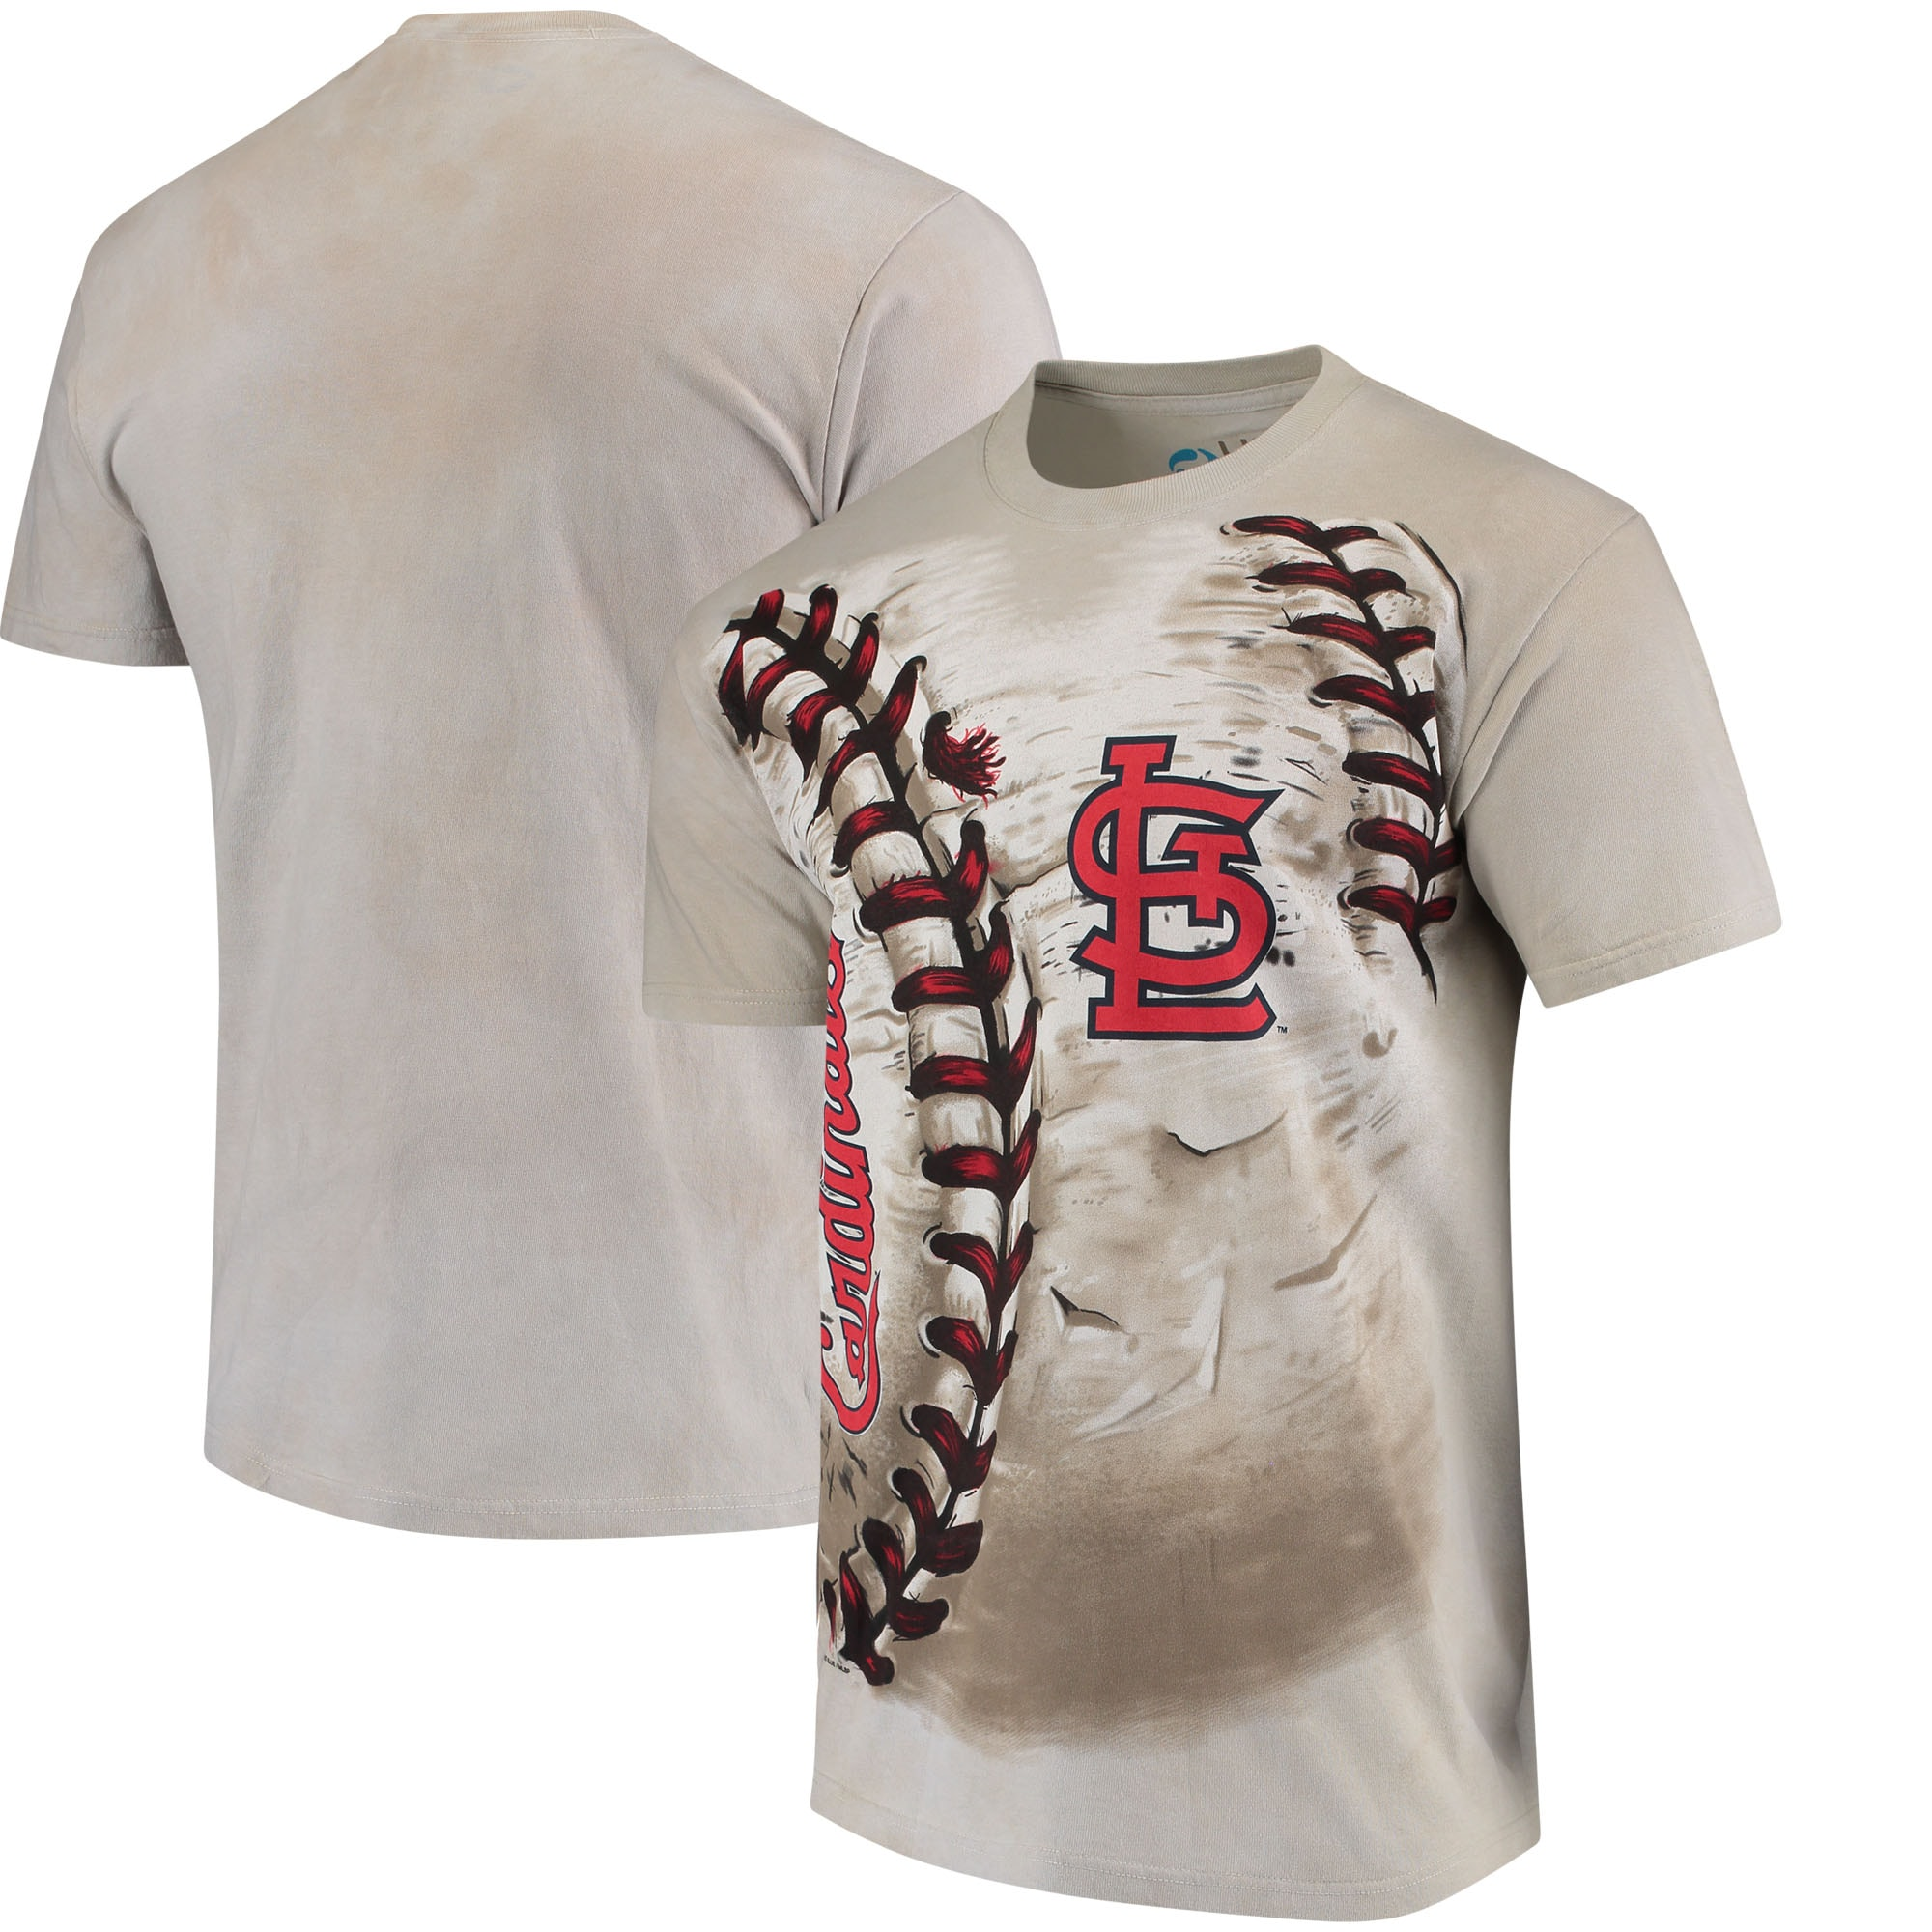 St. Louis Cardinals Hardball Tie-Dye T-Shirt - Cream